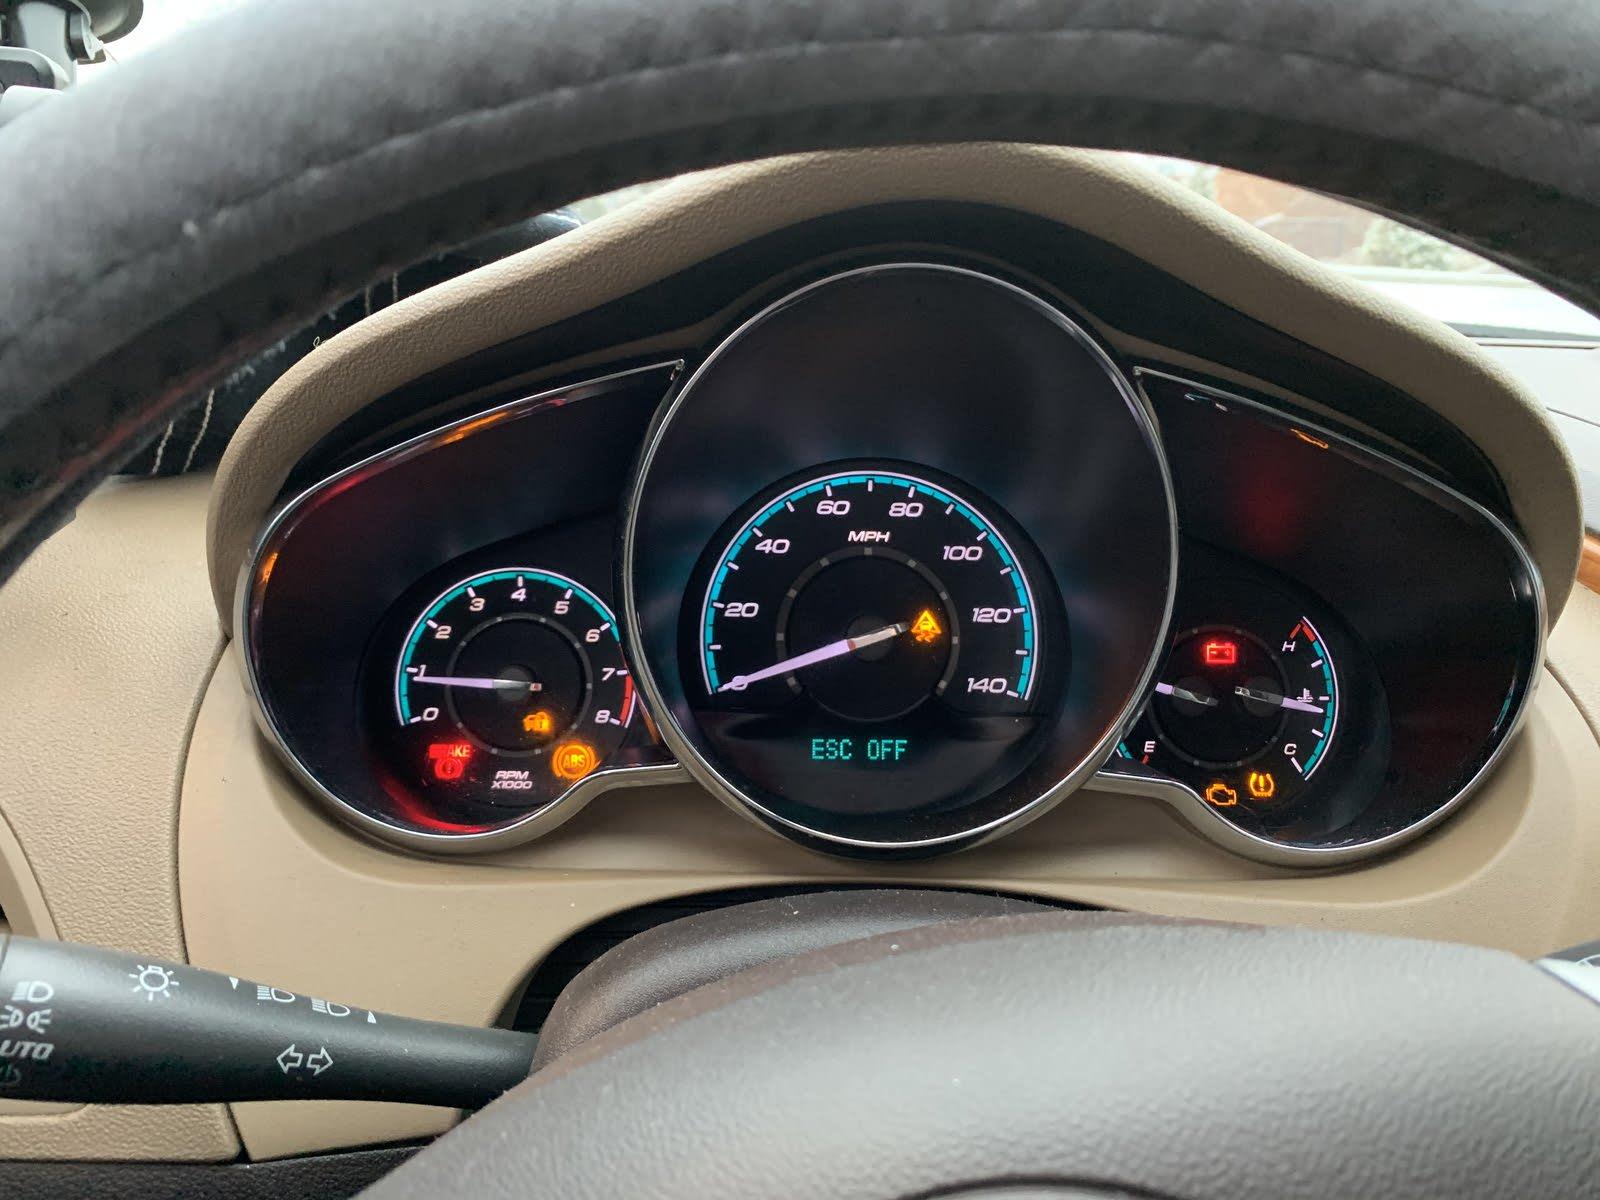 Service Esc Chevy Malibu >> Chevrolet Malibu Questions Esc Service Traction Reduced